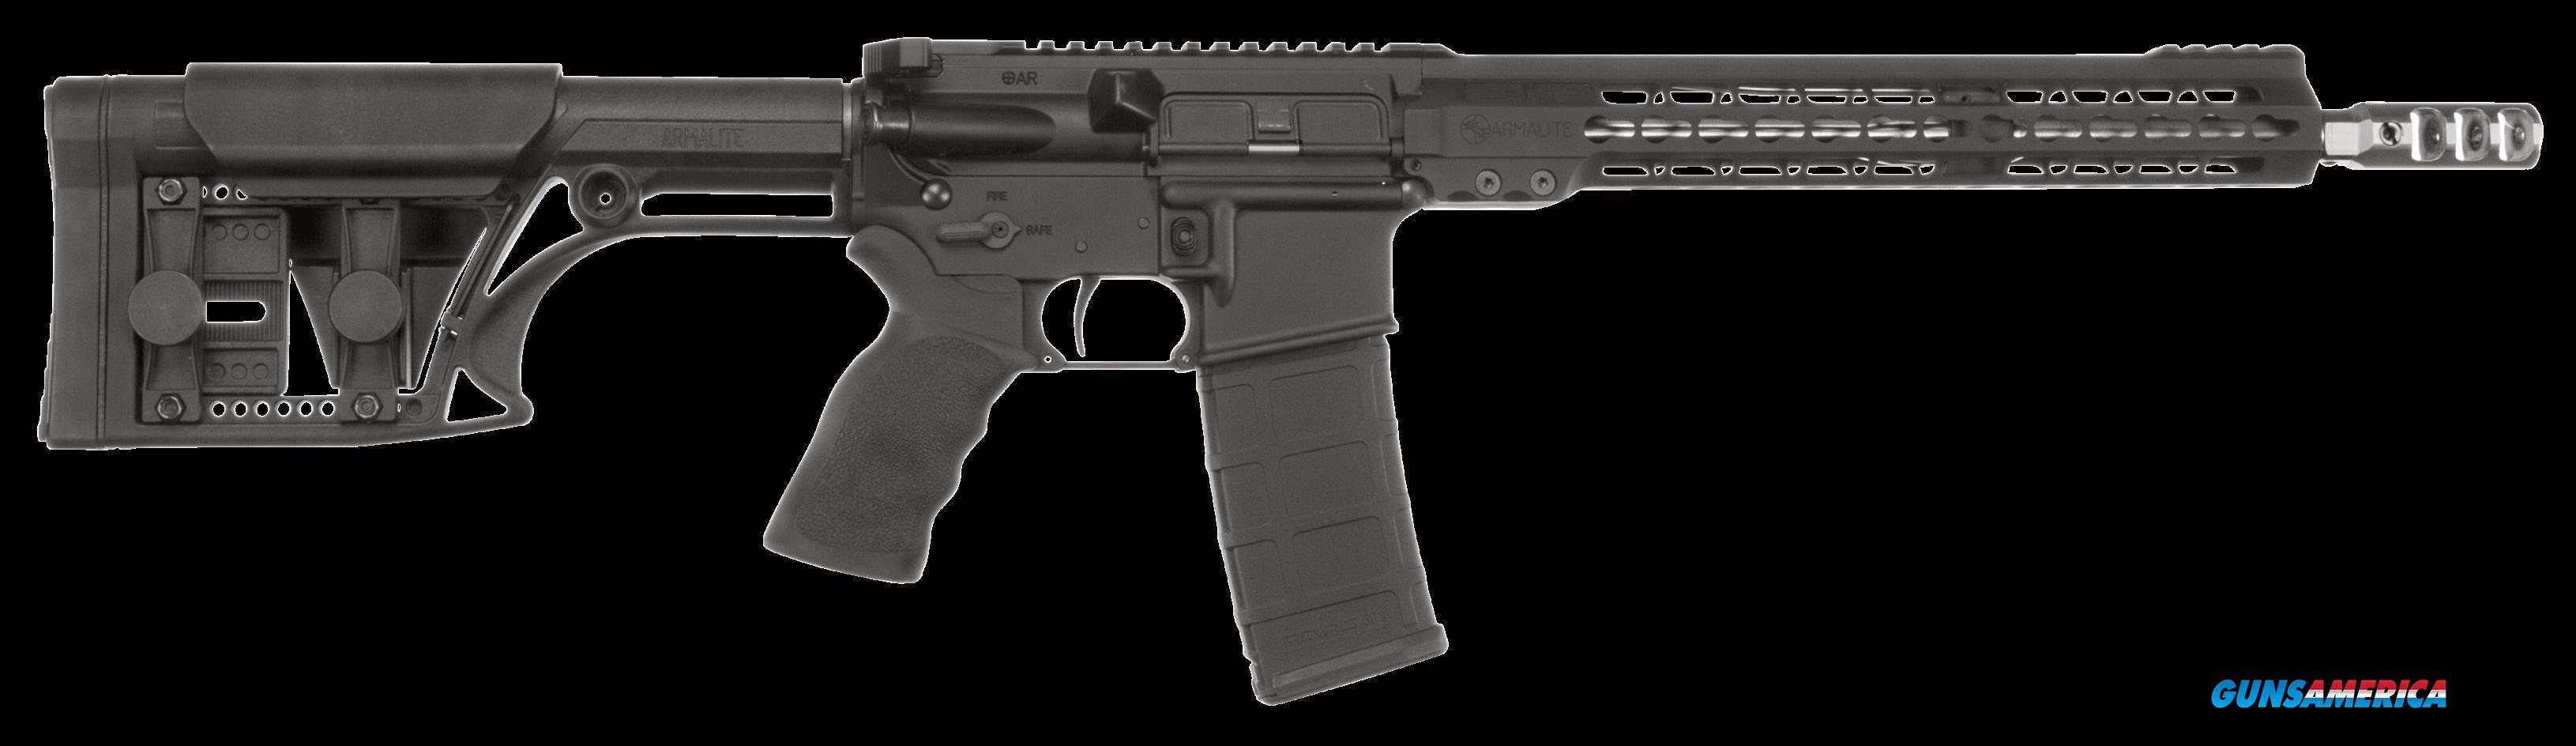 Armalite M-15, Arml M153gn13     M15 Wyl 3gun 223     13.5  Guns > Pistols > 1911 Pistol Copies (non-Colt)